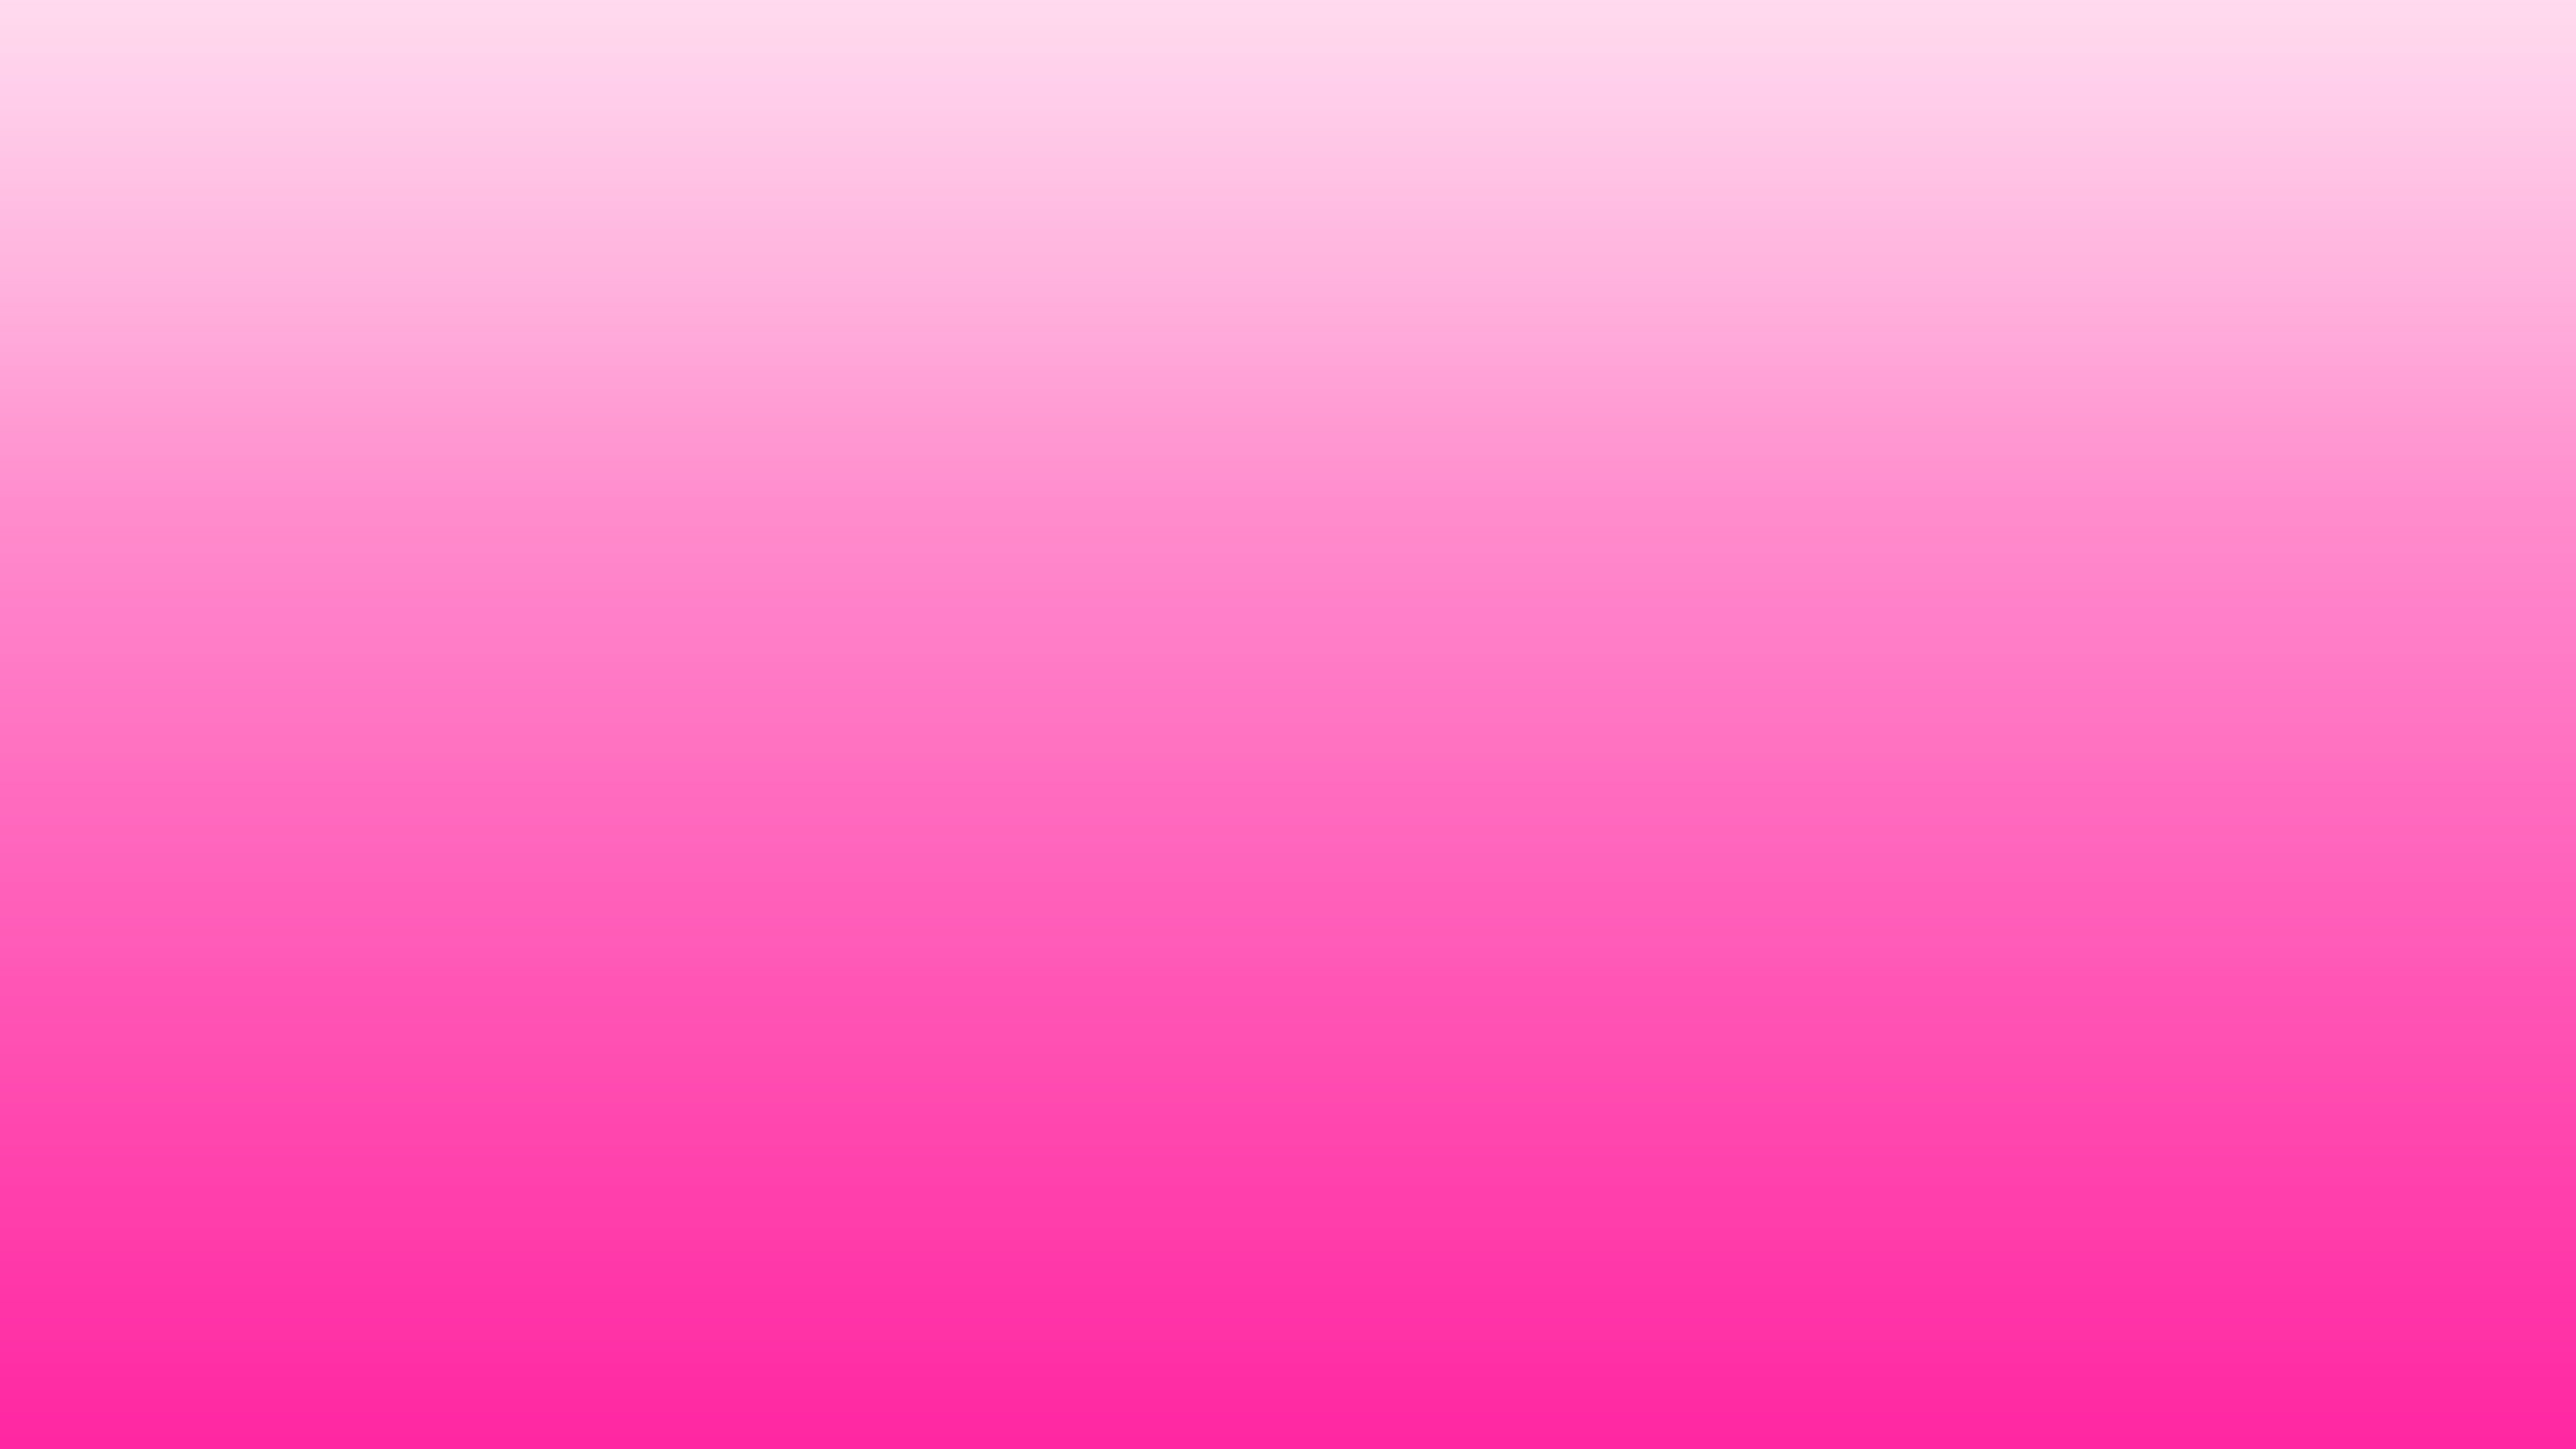 Wallpaper rosa Background rosa Plano de fundo rosa